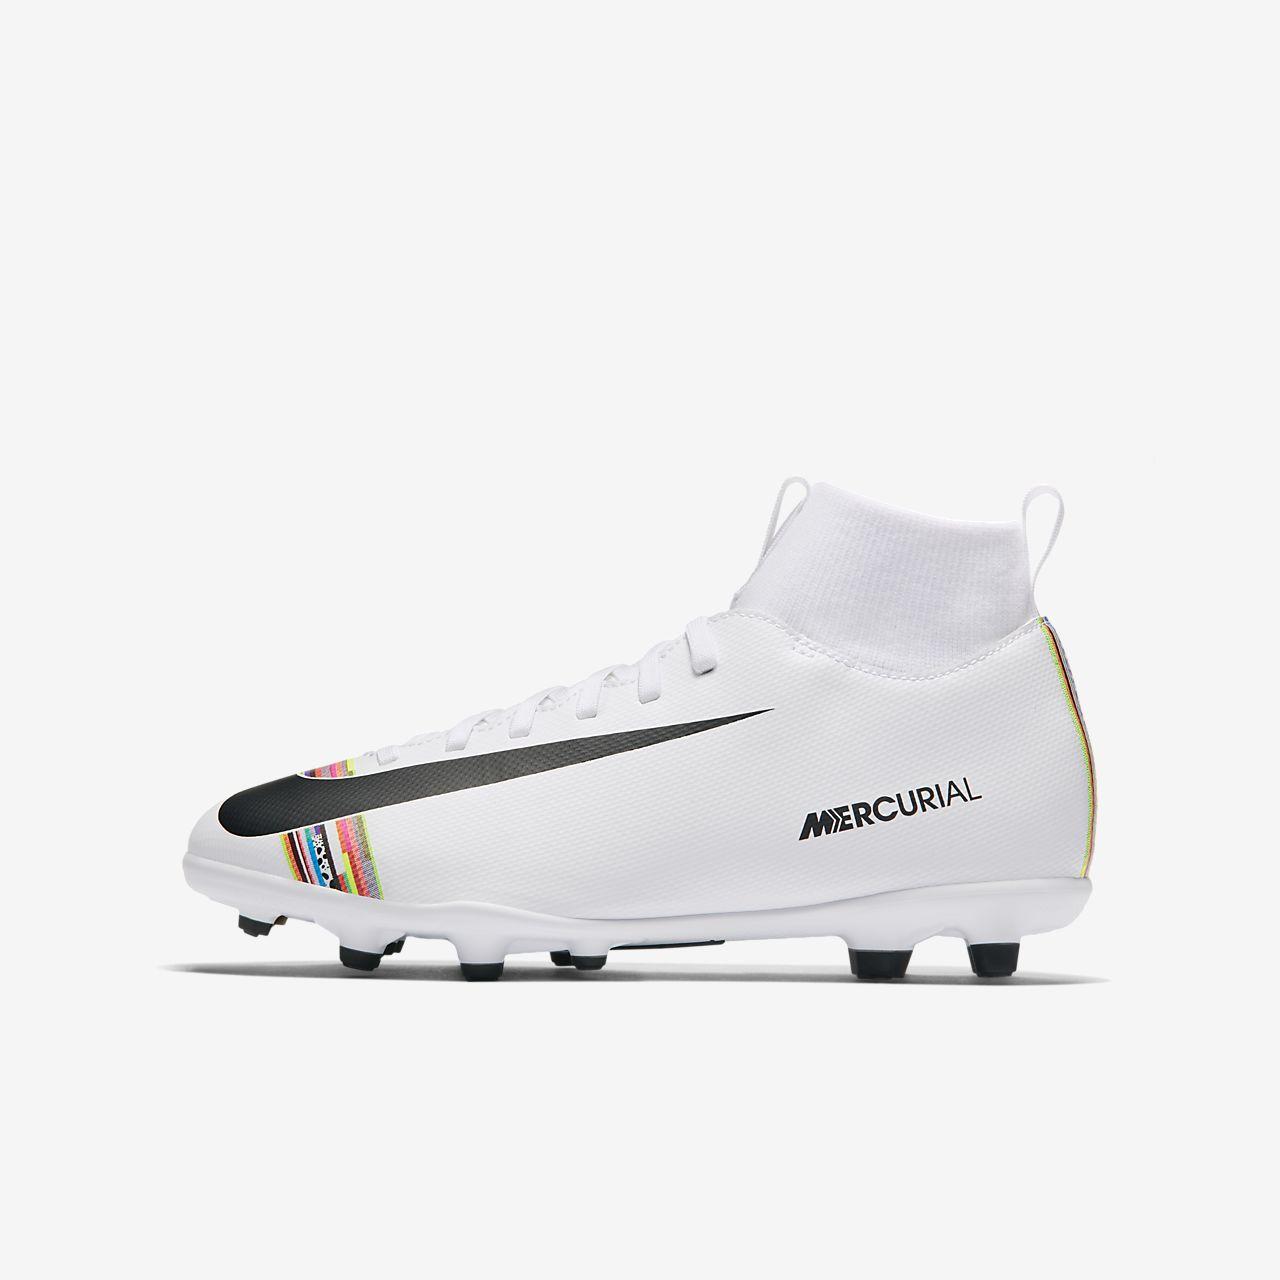 fcd00761a4c61 ... Calzado de fútbol para múltiples superficies para niños talla  pequeña grande Nike Jr. Superfly